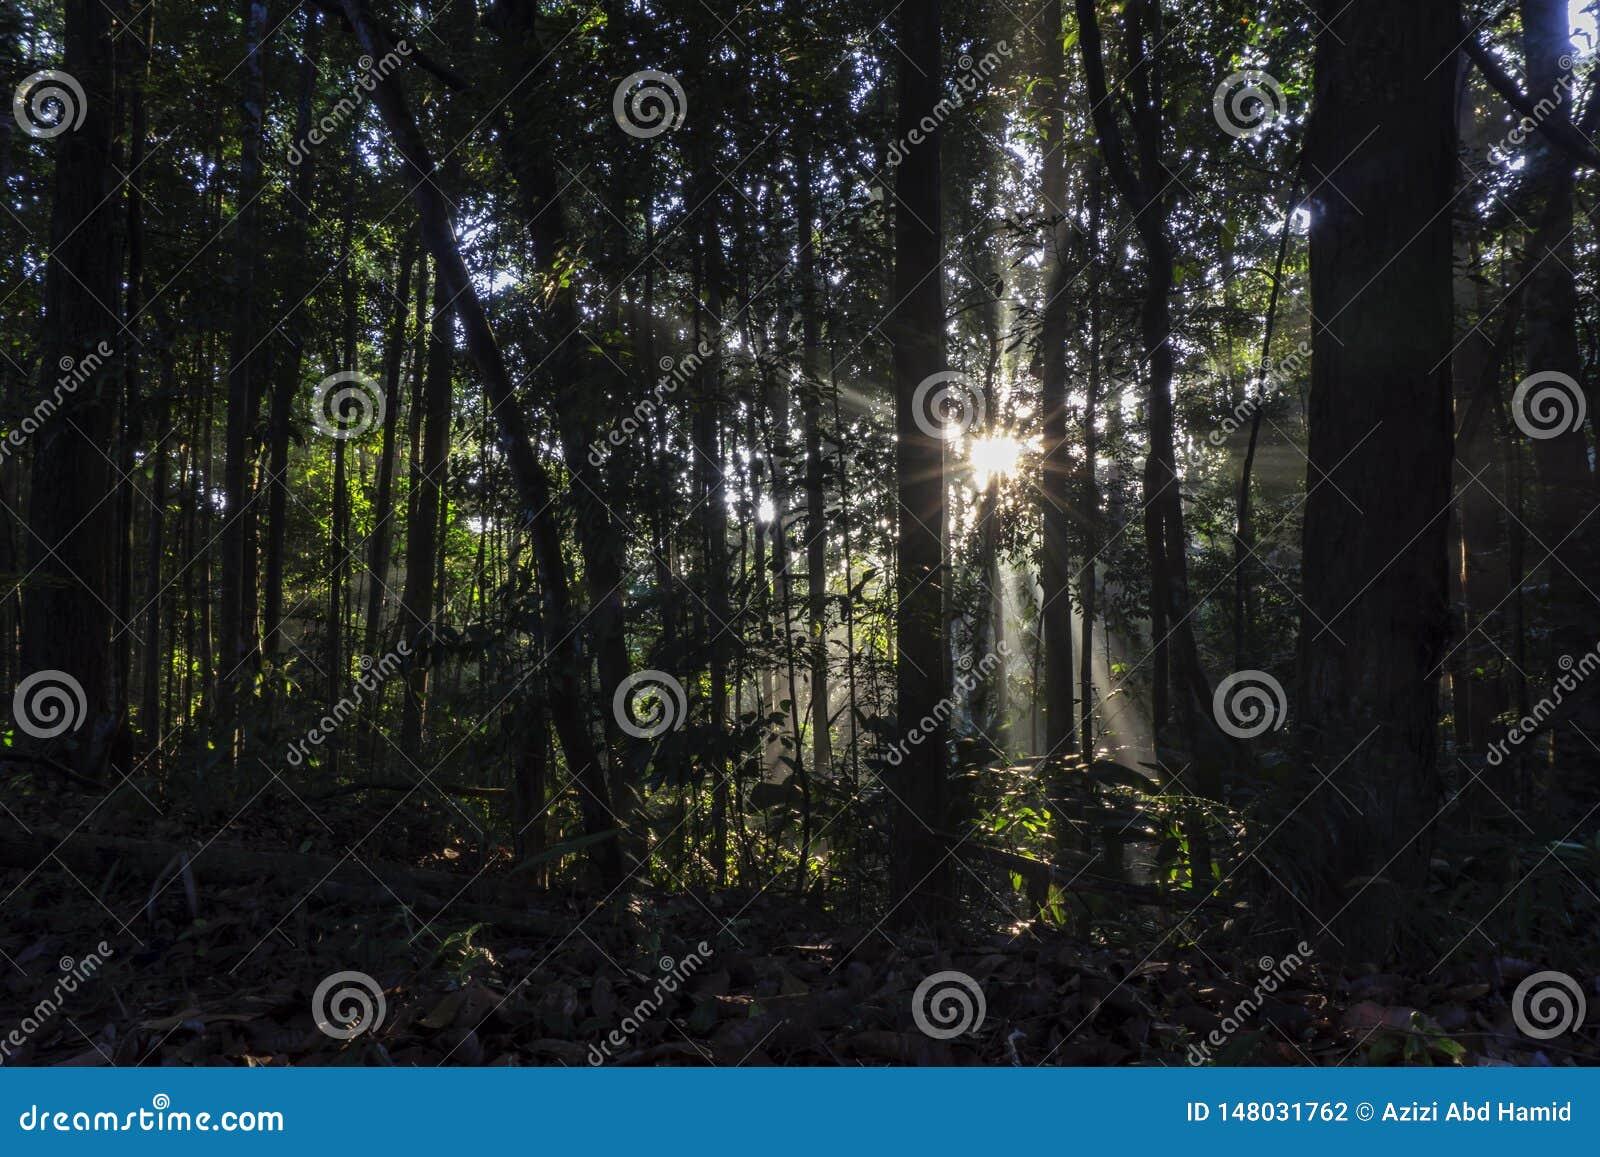 Morning sunrise passes through the forest